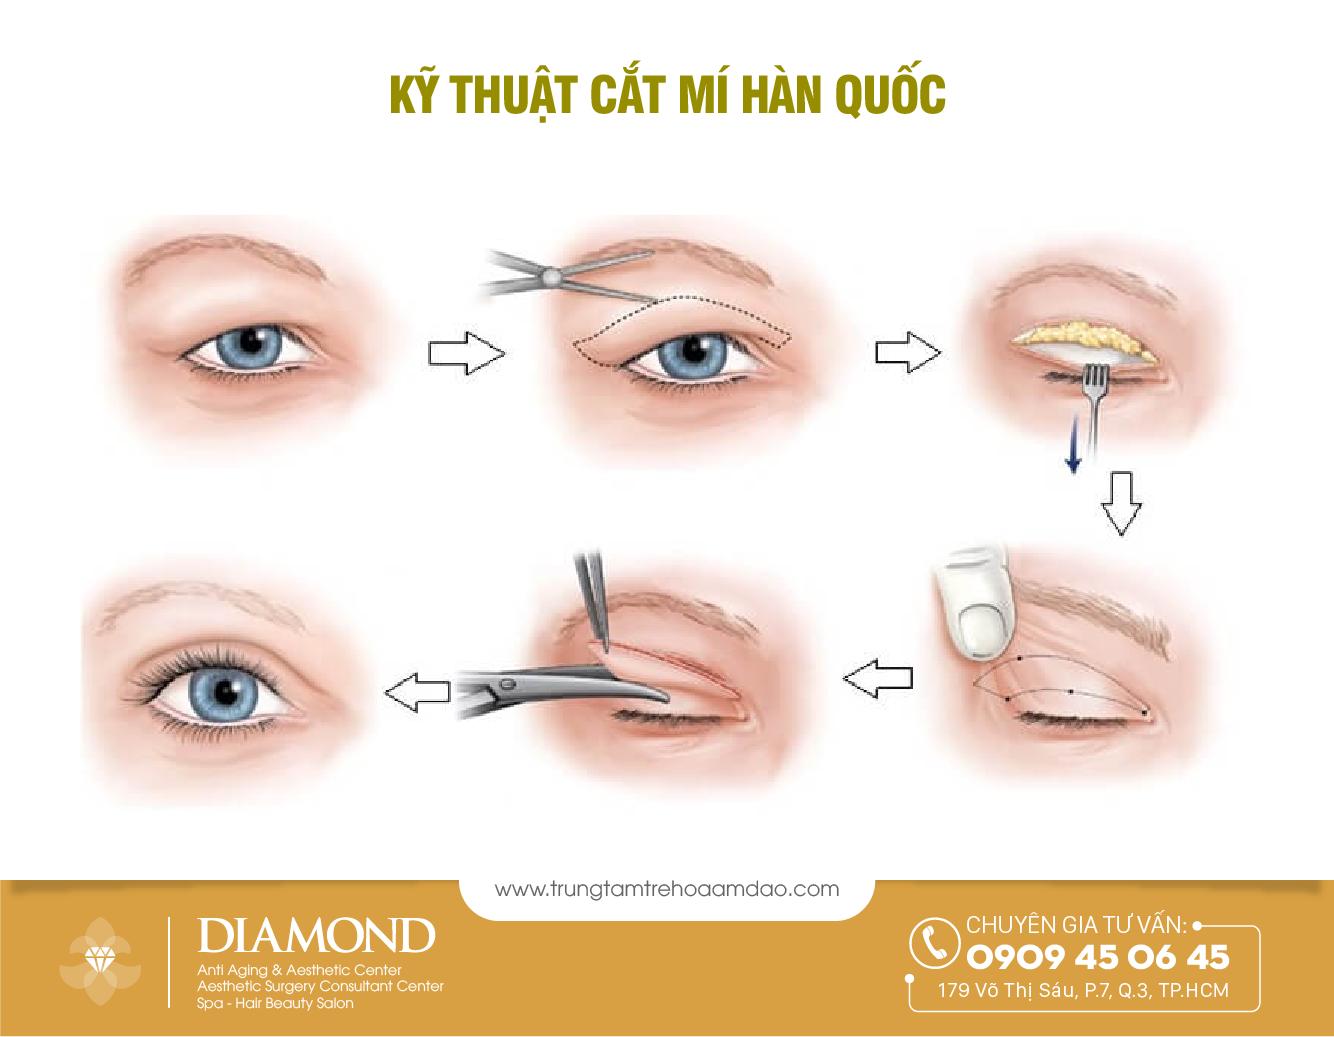 mo-phong-ki-thuat-cat-mi-han-quoc-diamond